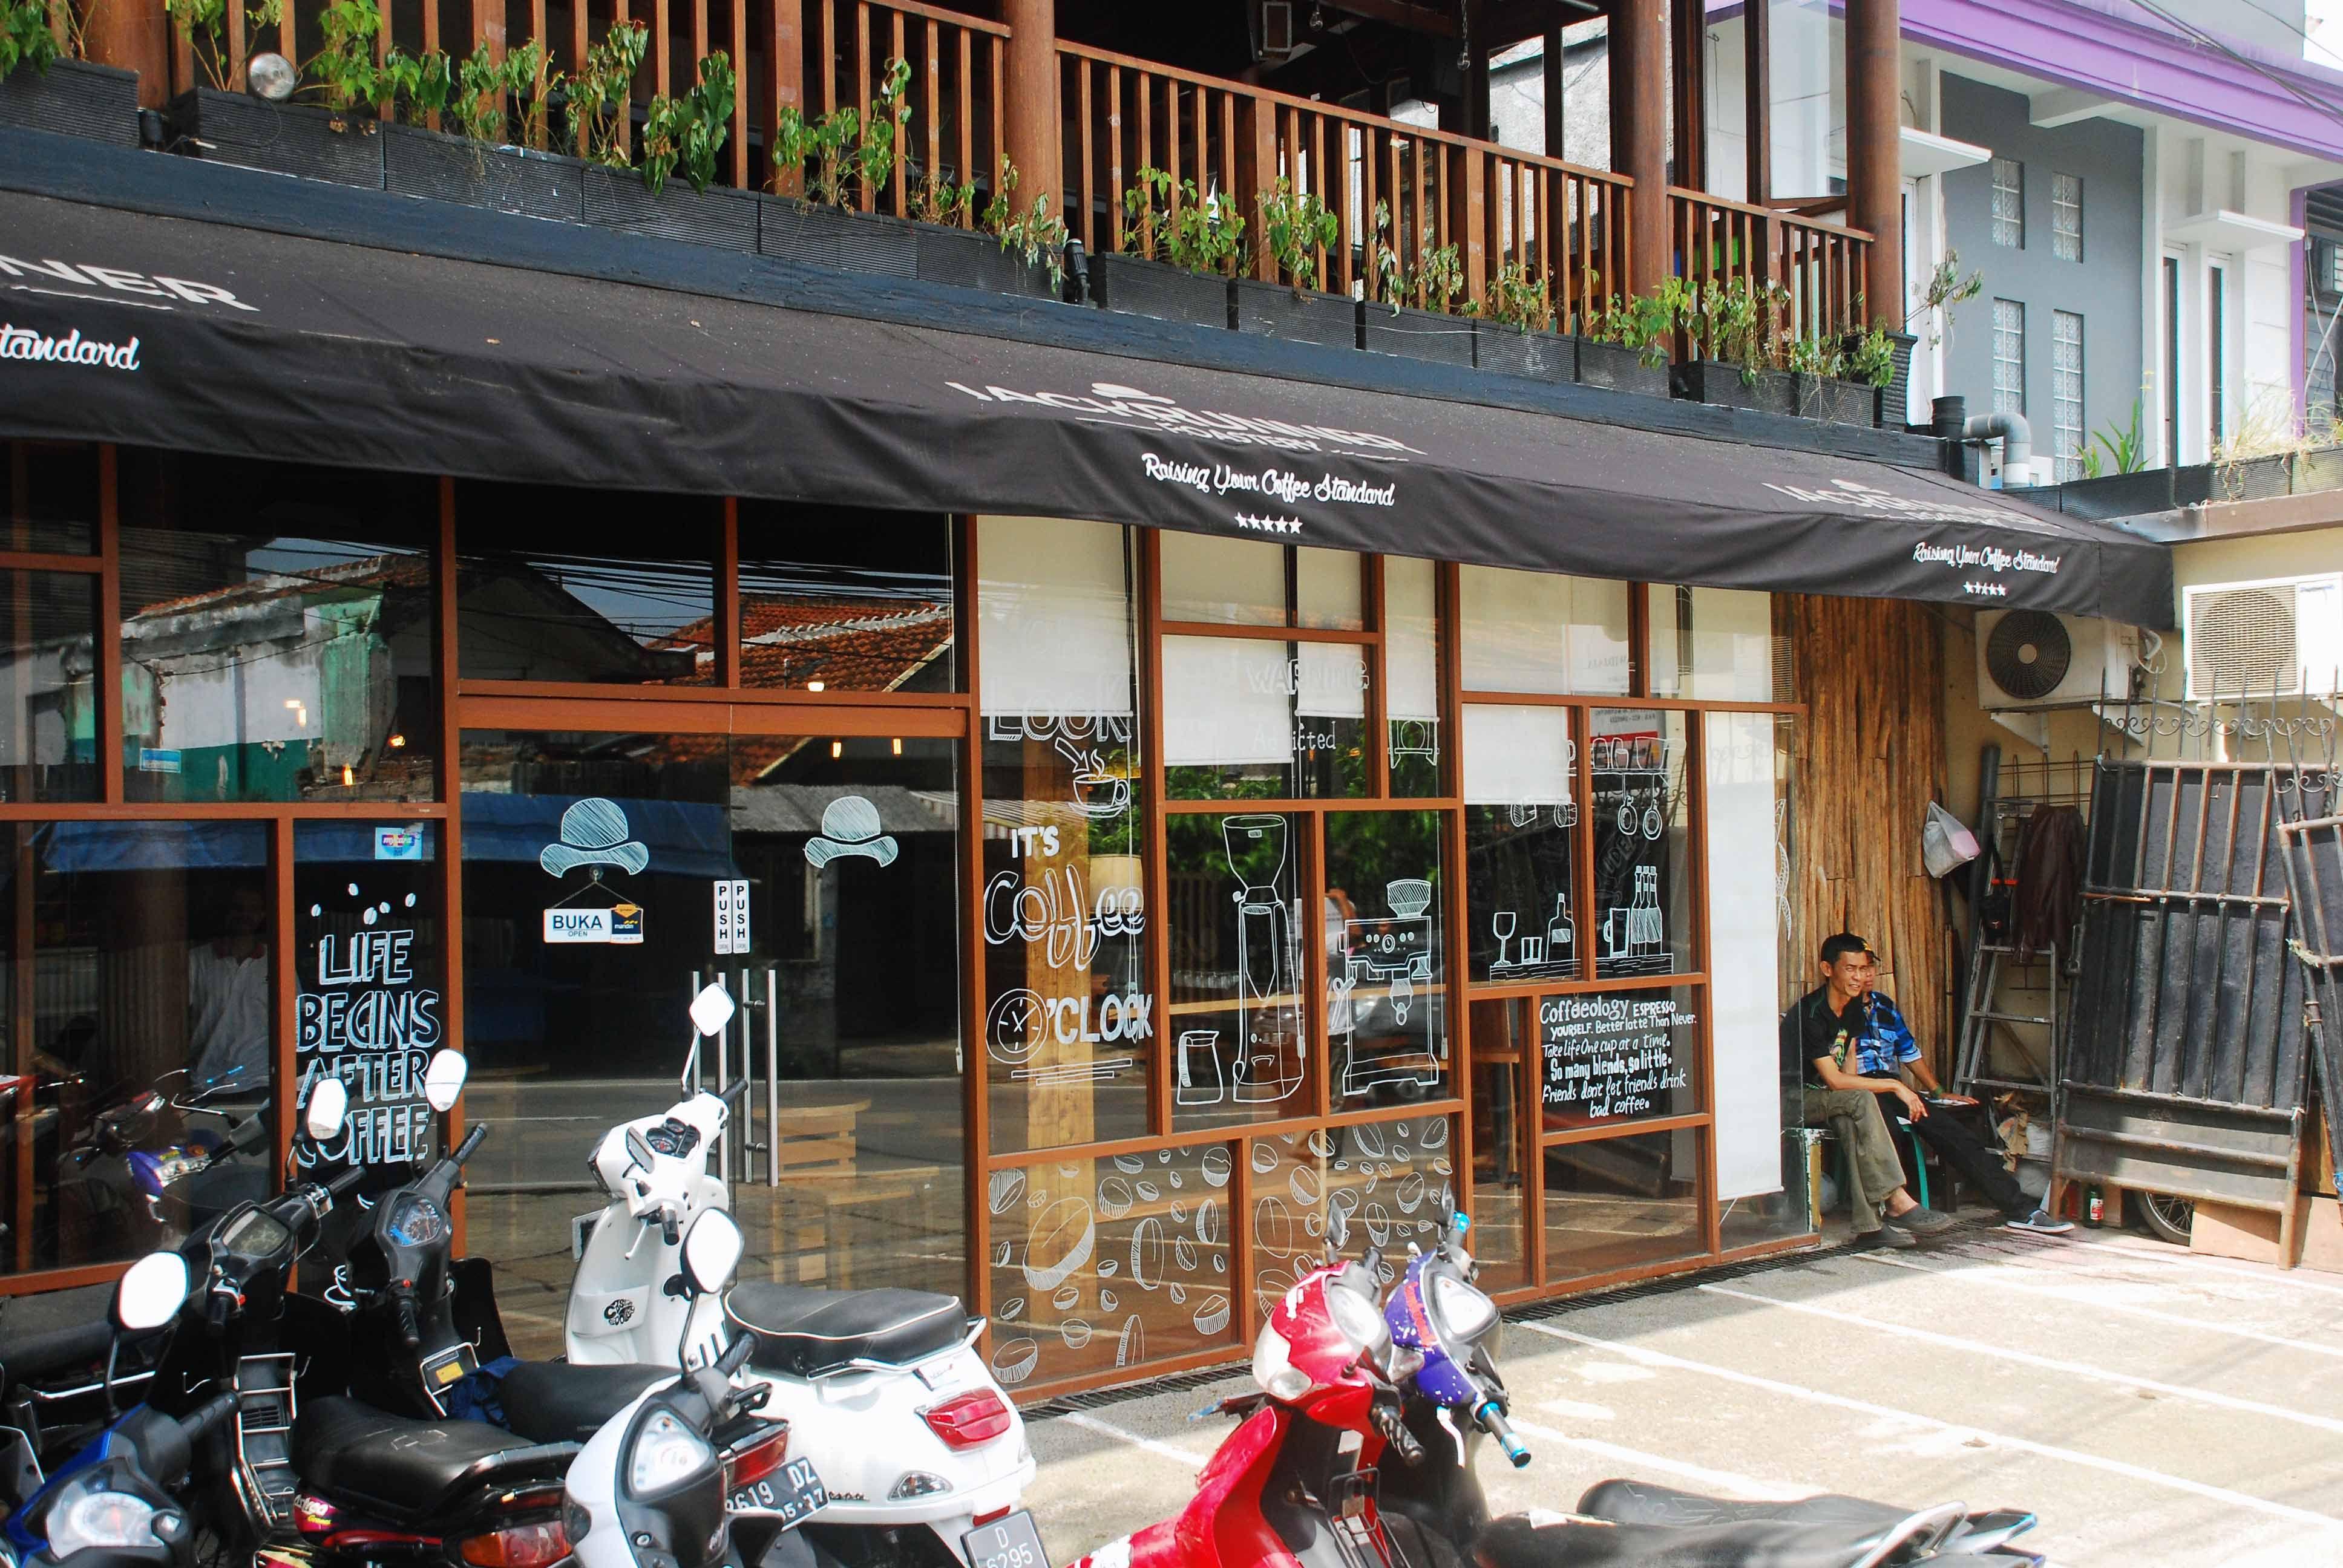 10 Coffee Shop Di BANDUNG Yang Paling Asyik (Dengan gambar